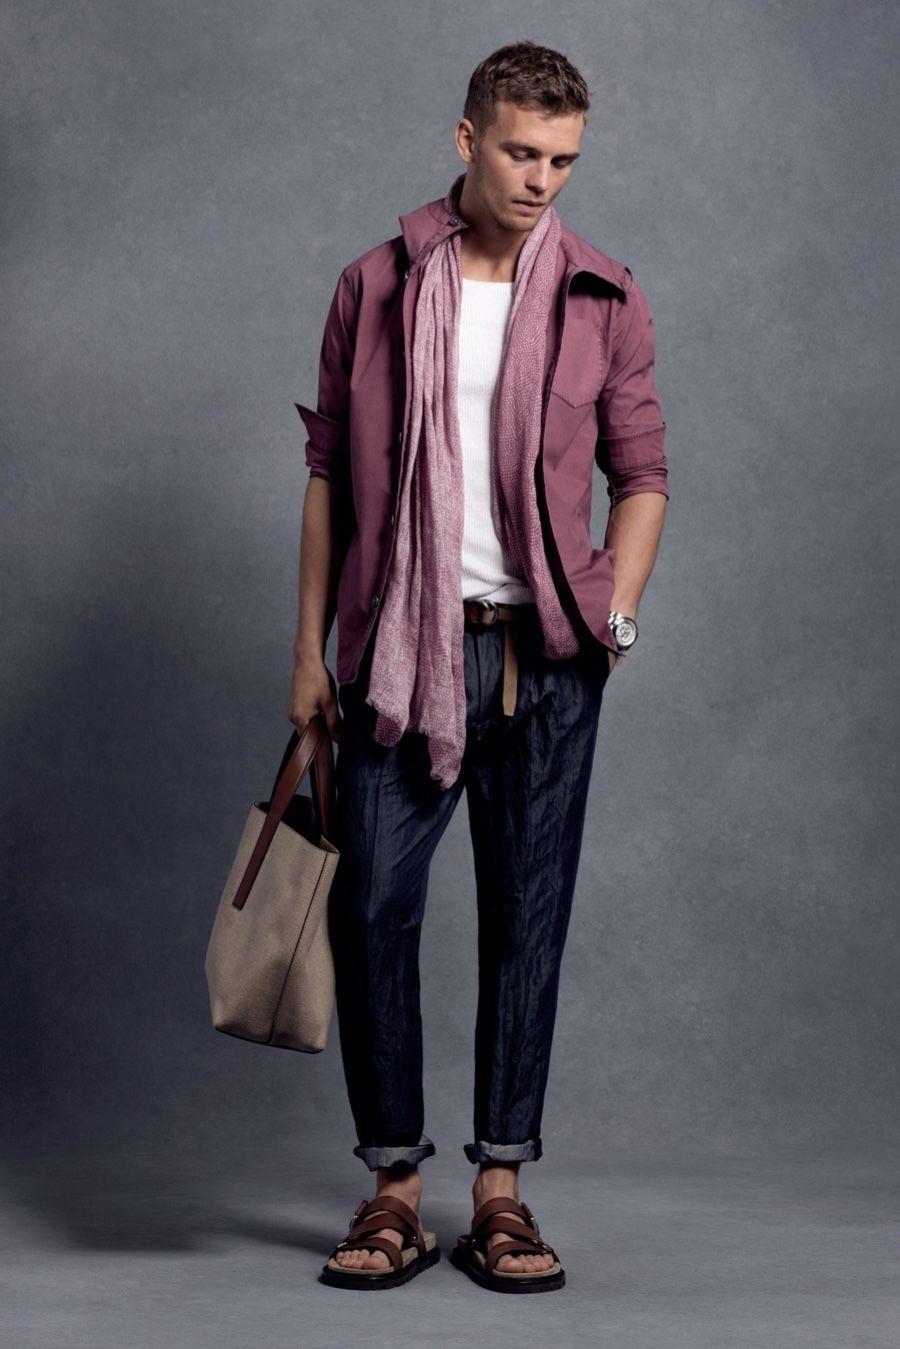 Michael Kors Menswear: AW14 Collection Michael Kors Menswear: AW14 Collection new pics